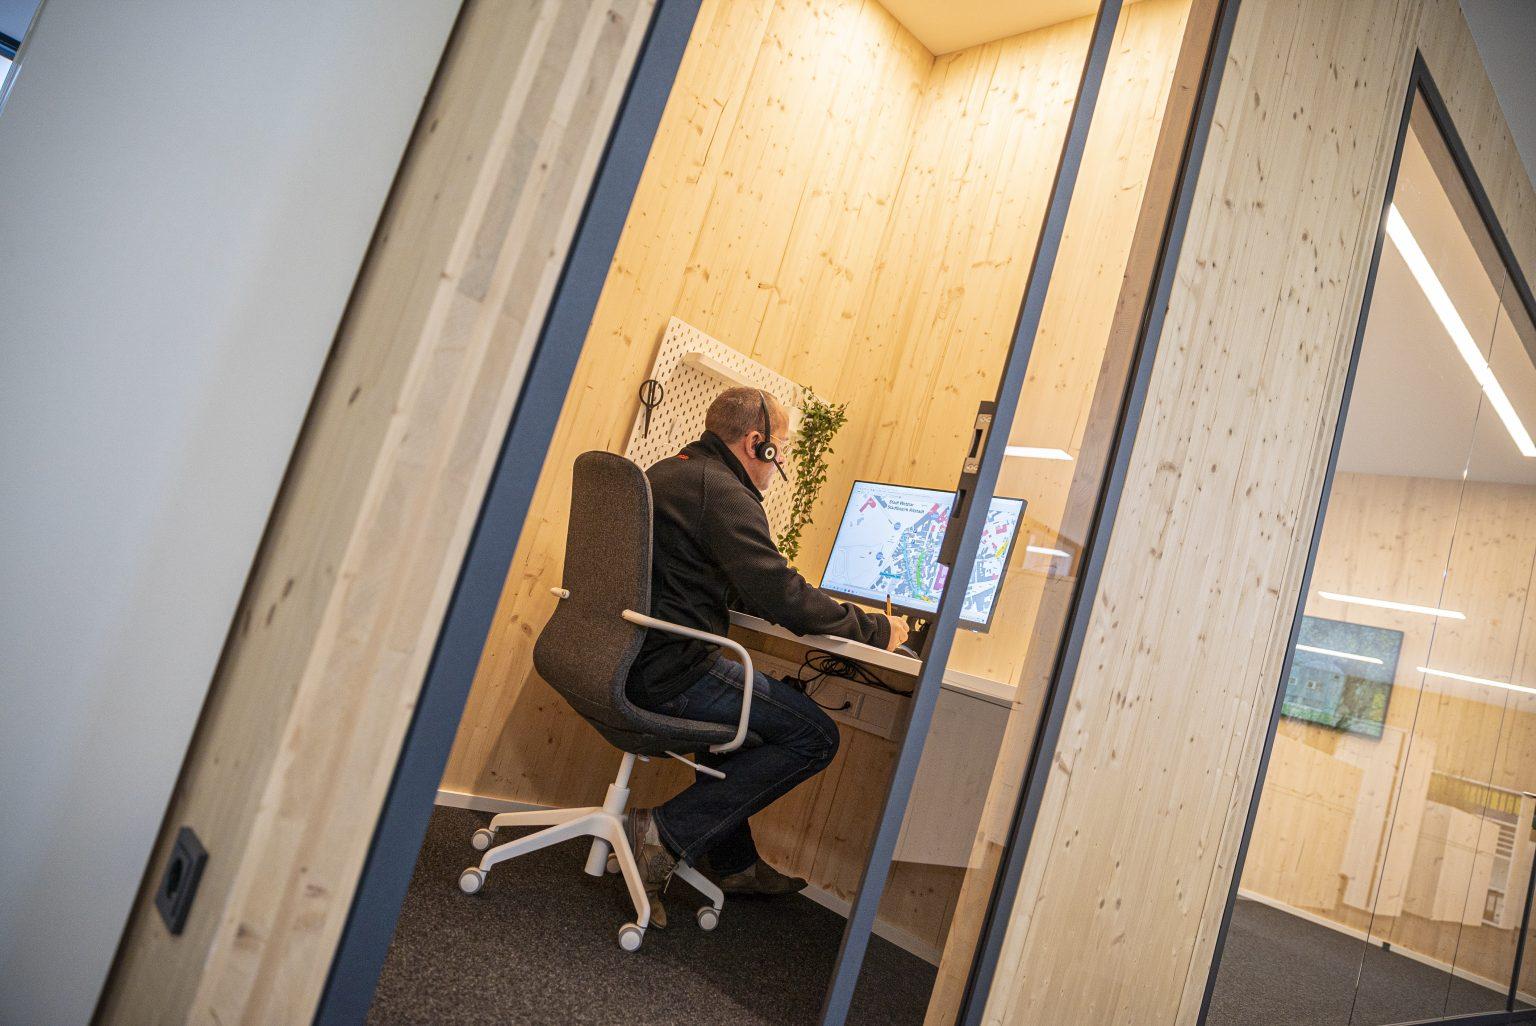 Bürogebäude_Zick-Hessler_Holzbauweise (4)